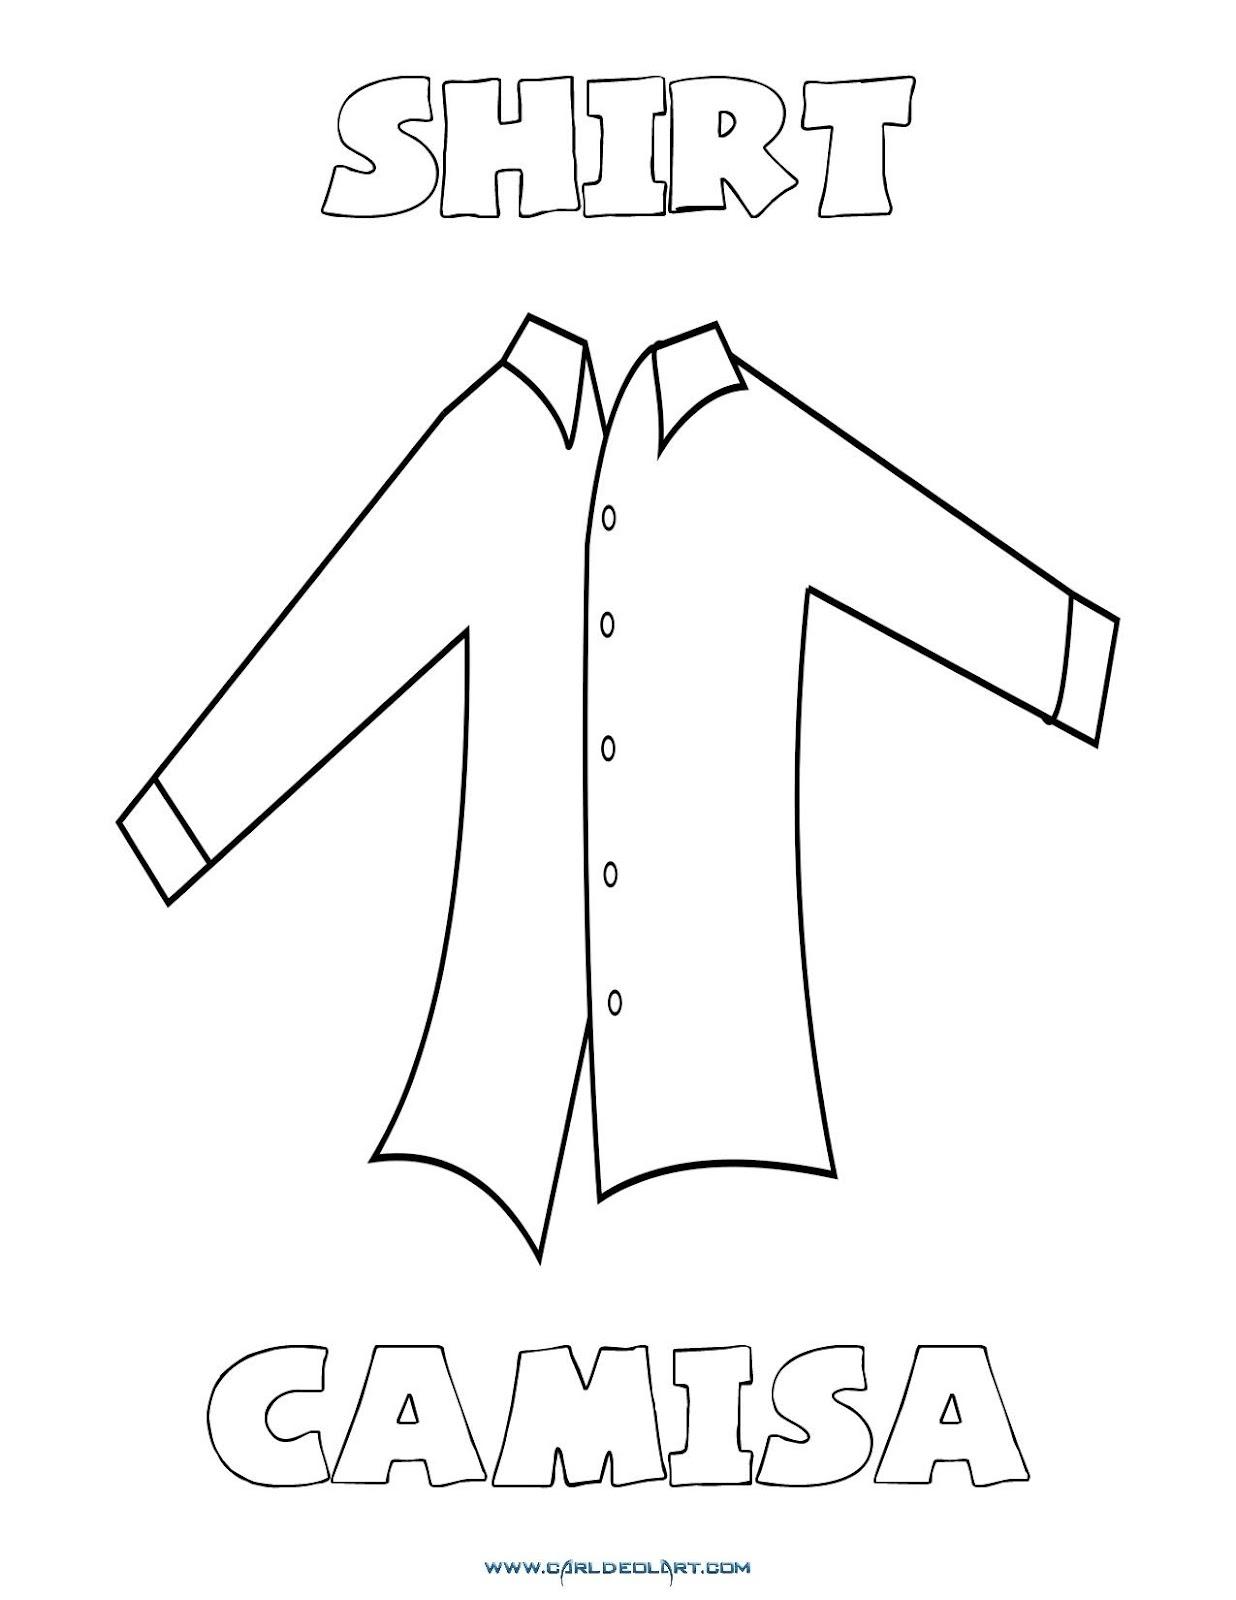 33f62ed9cac1c Dibujos inglés español con jpg 1236x1600 Camisa en dibujo